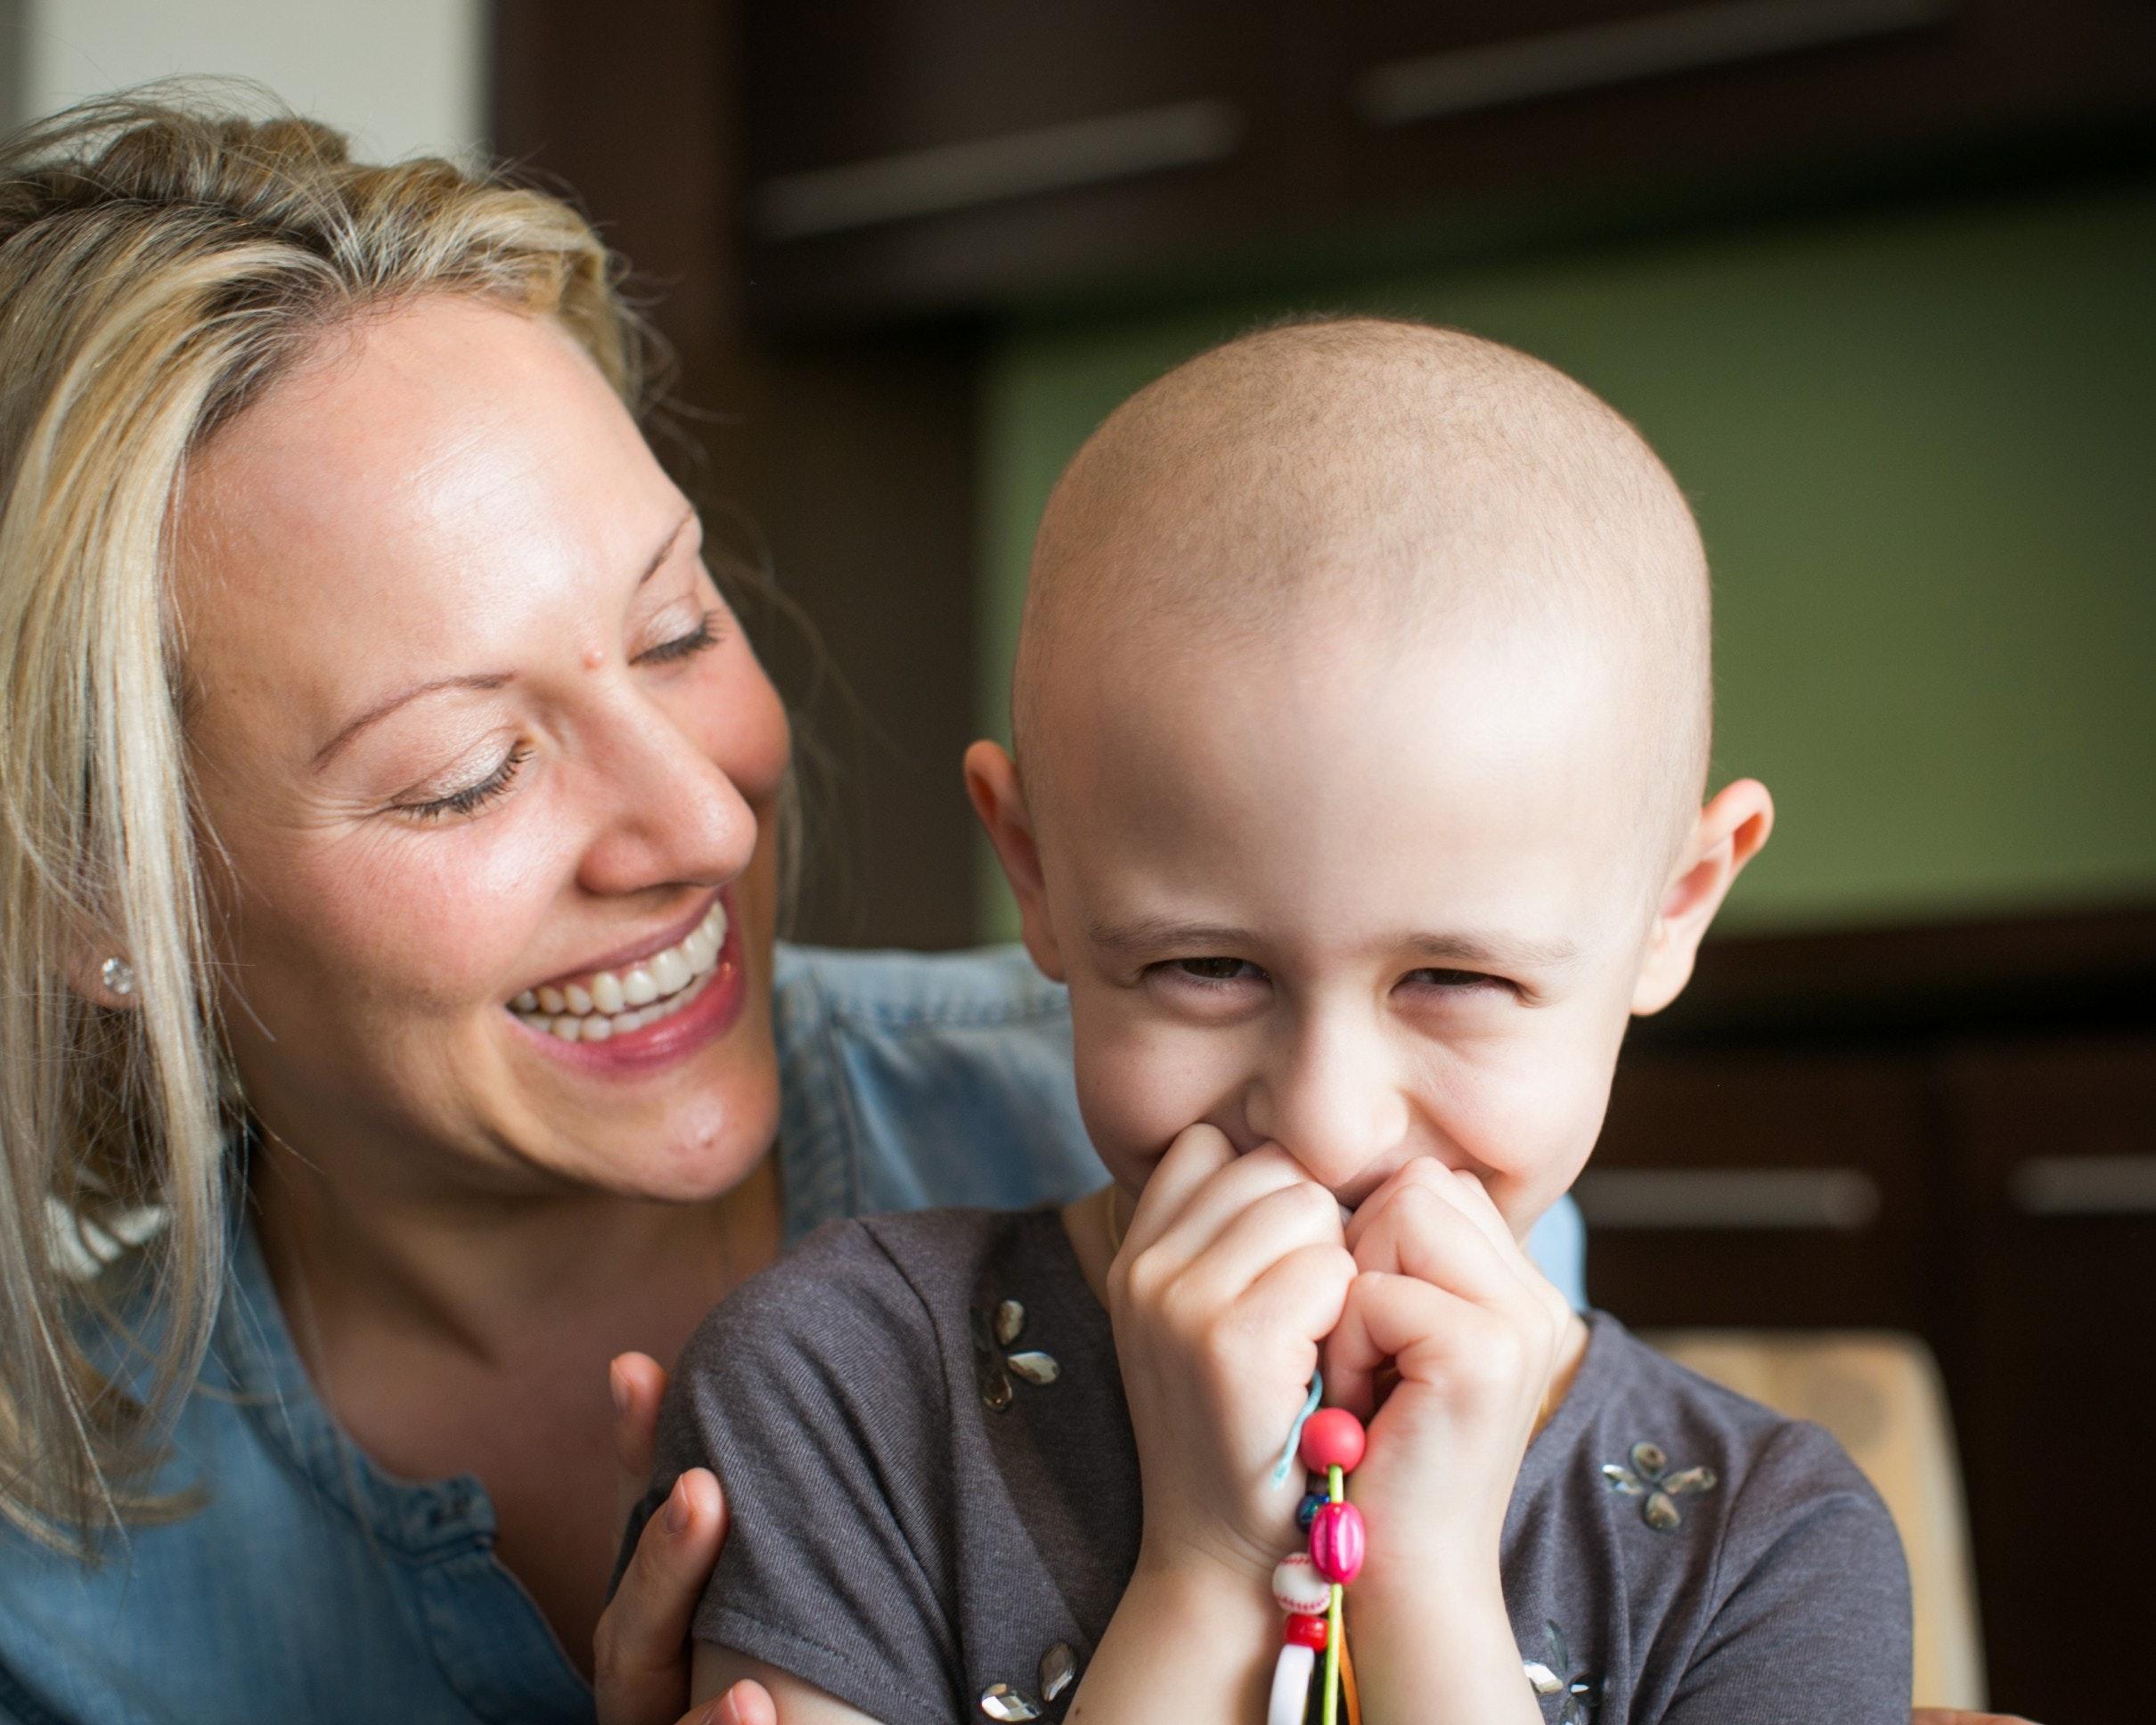 POGO (Pediatric Oncology Group of Ontario)